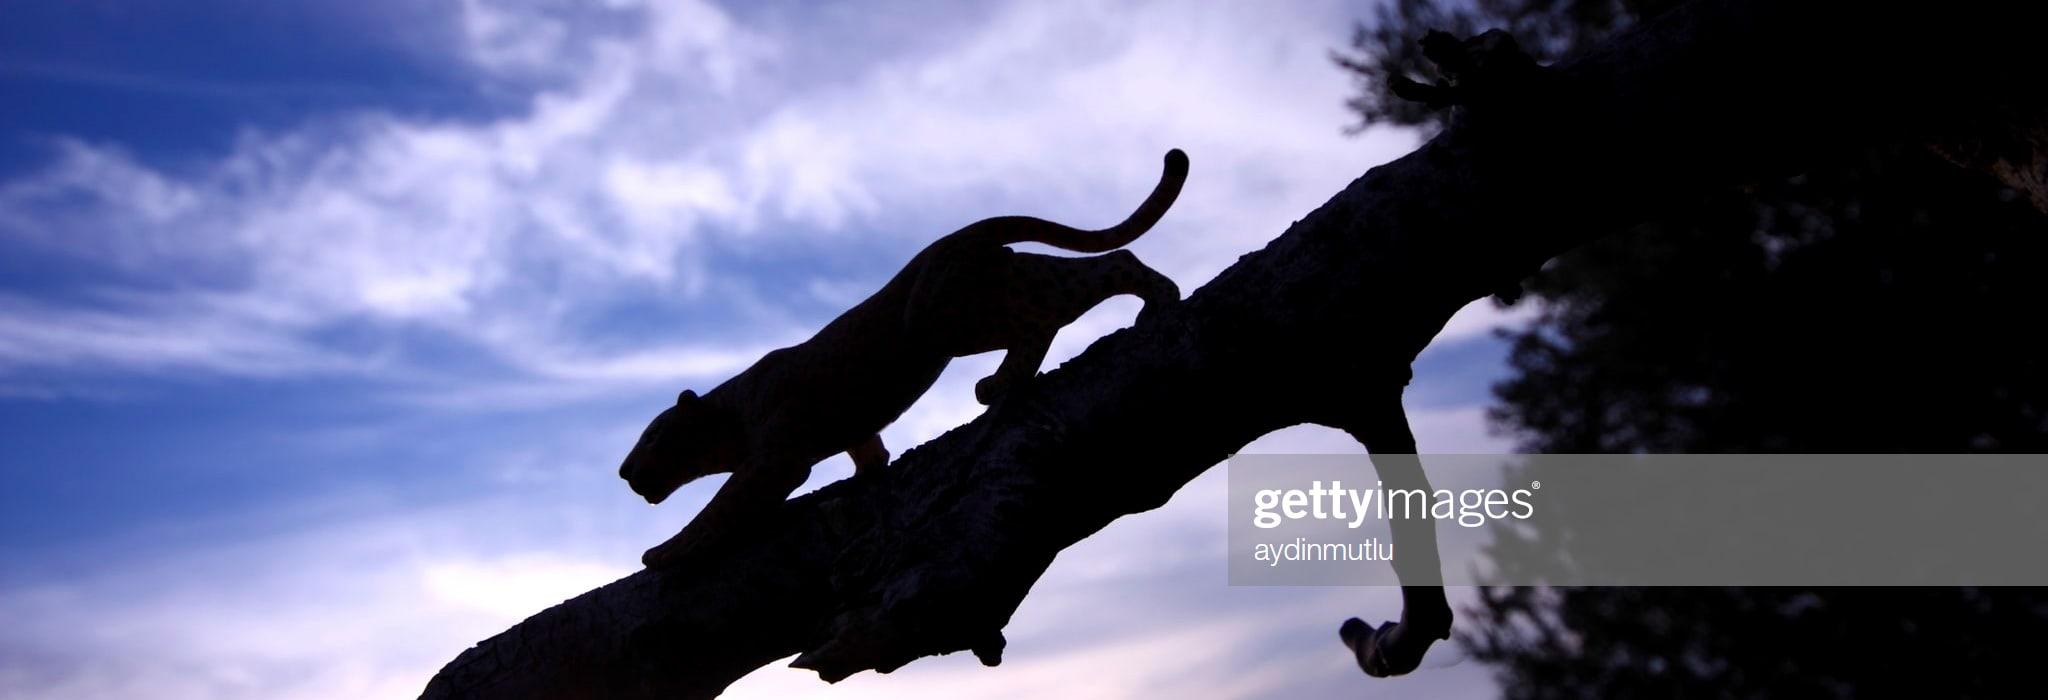 2020-03leopard-silhouette-picture-id160179694